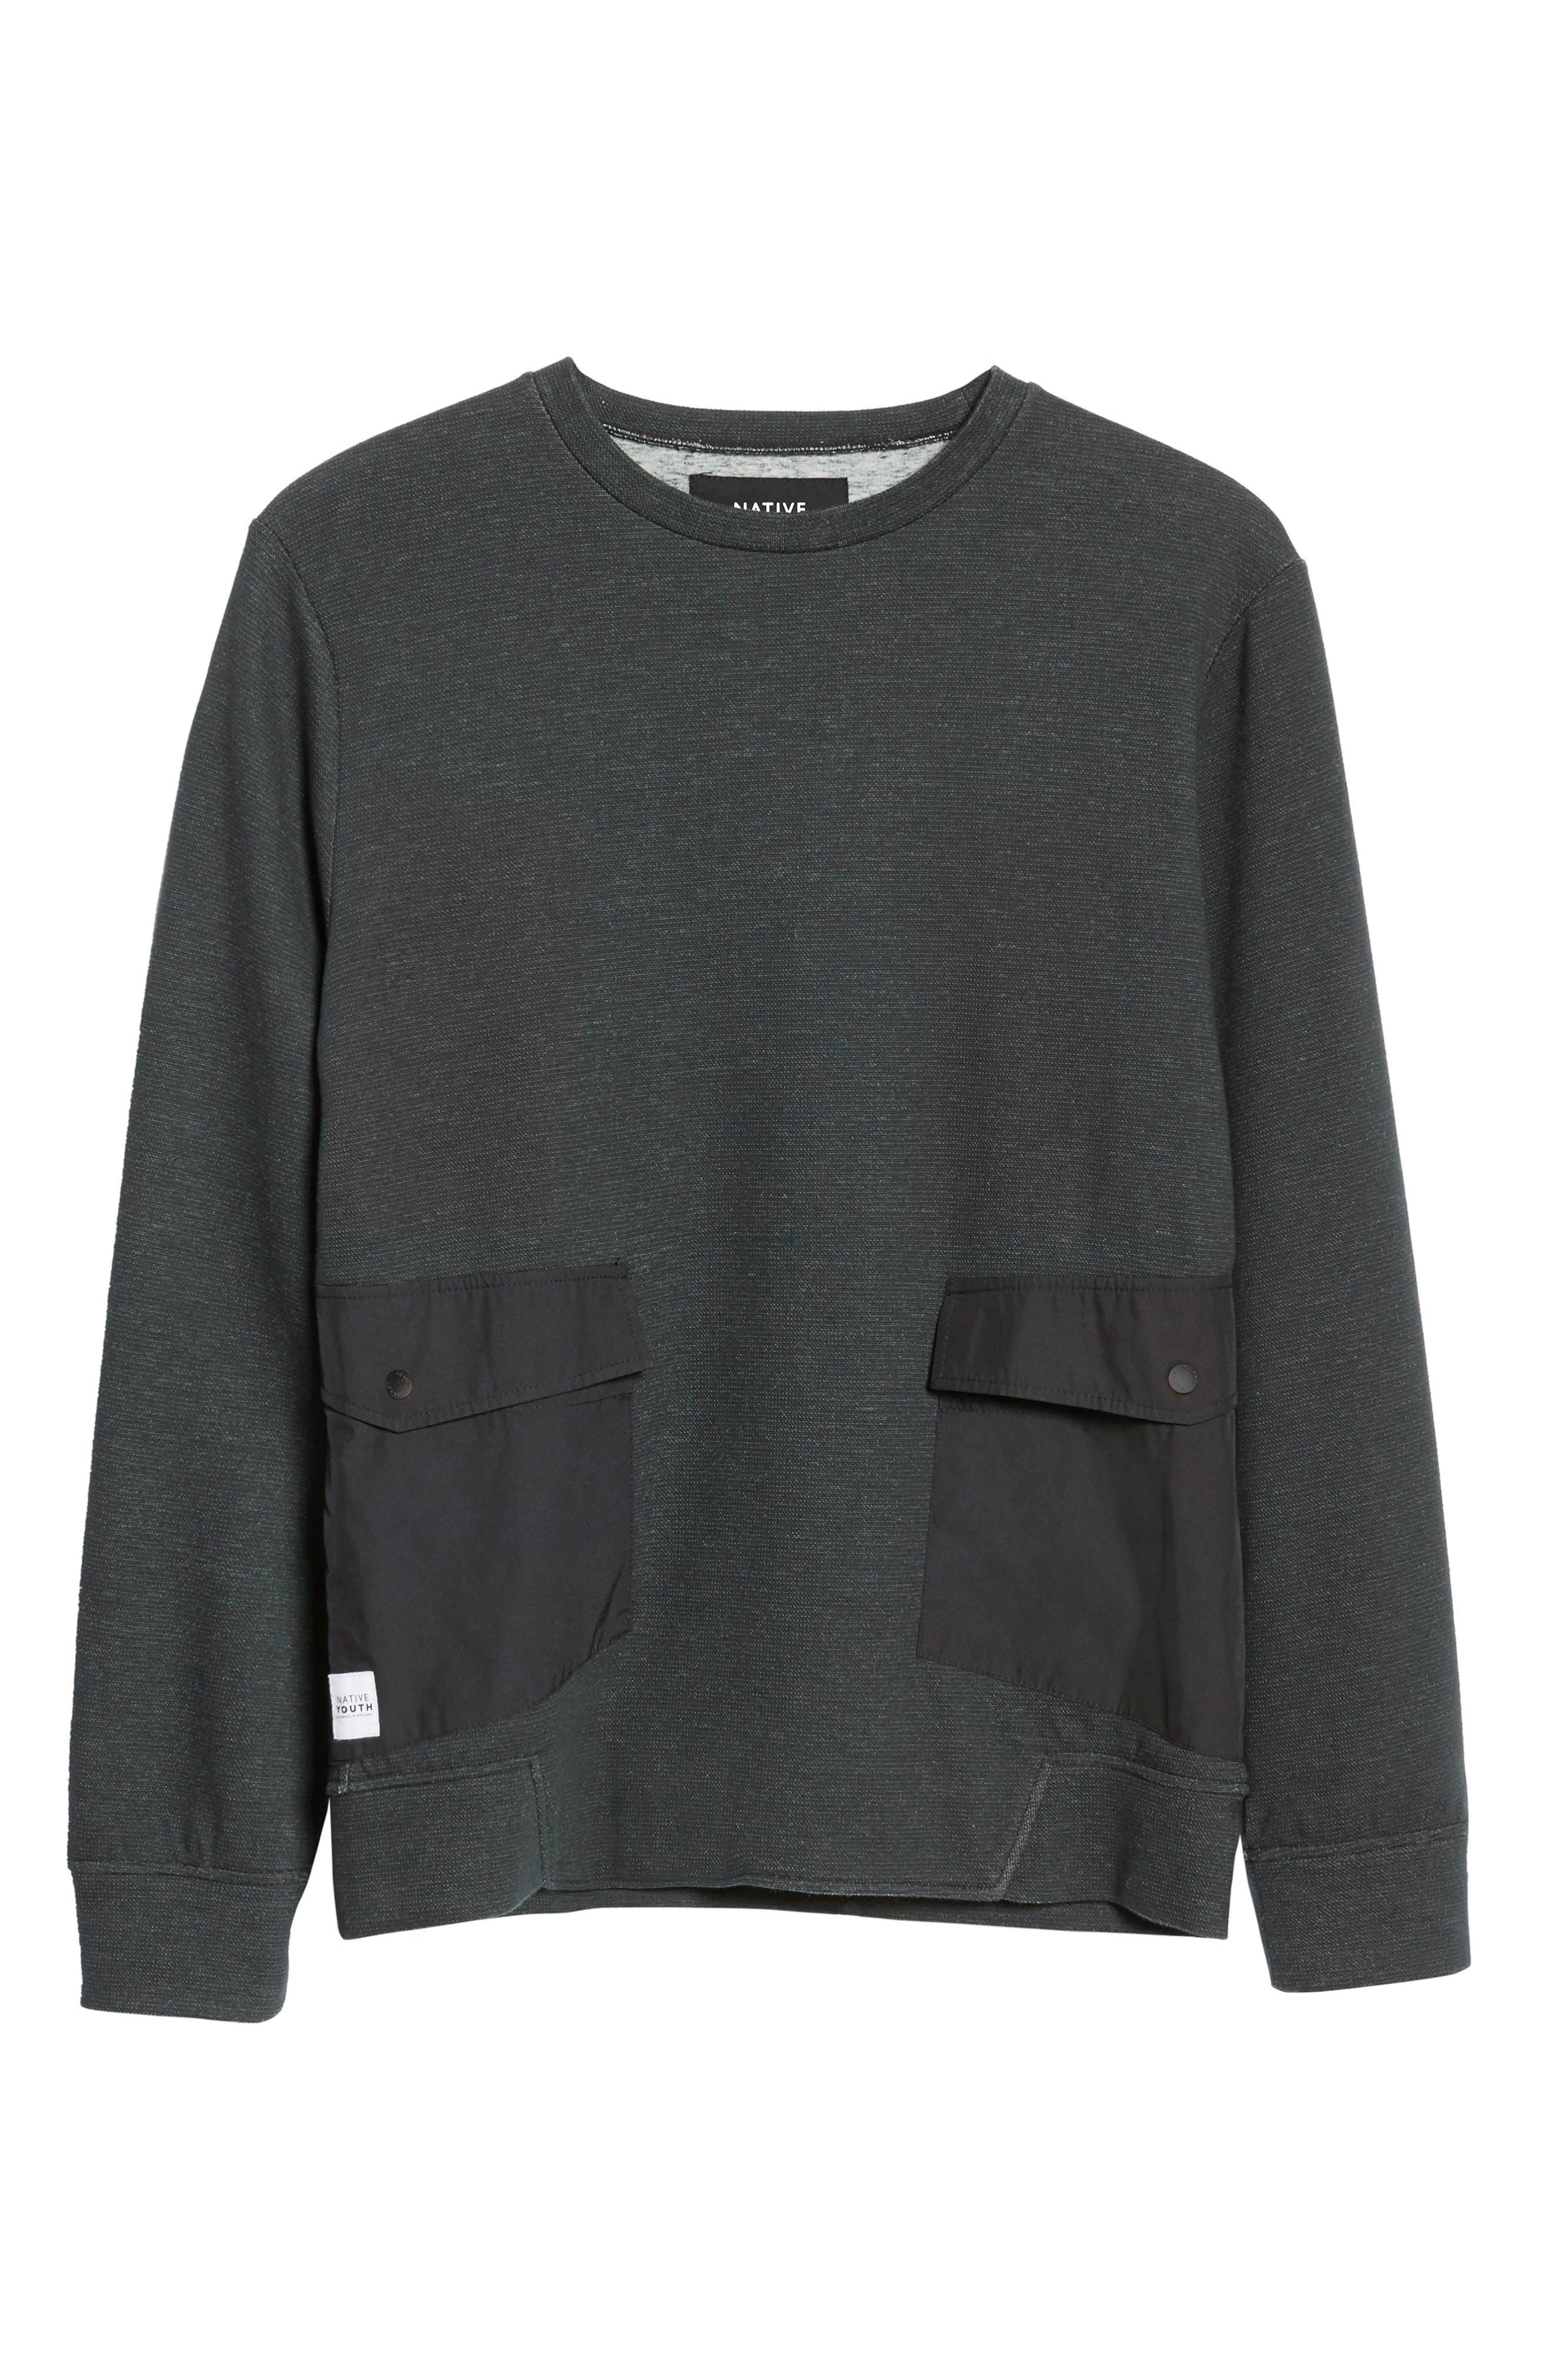 Oracle Sweatshirt,                             Alternate thumbnail 6, color,                             Green